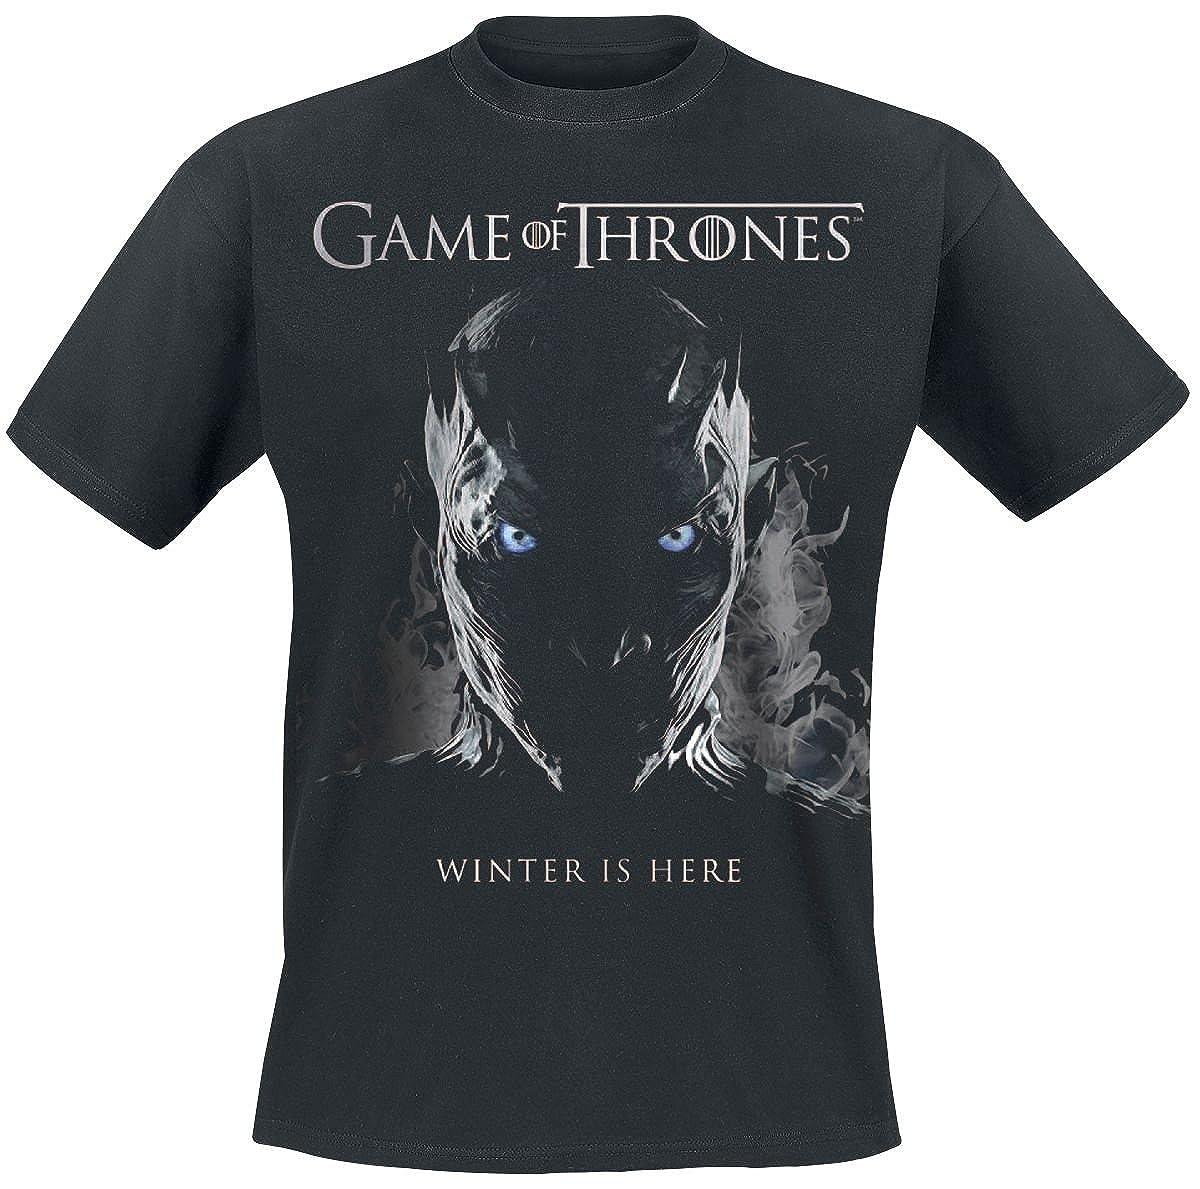 Game of Thrones Nachtk/önig Rising T-Shirt Nero